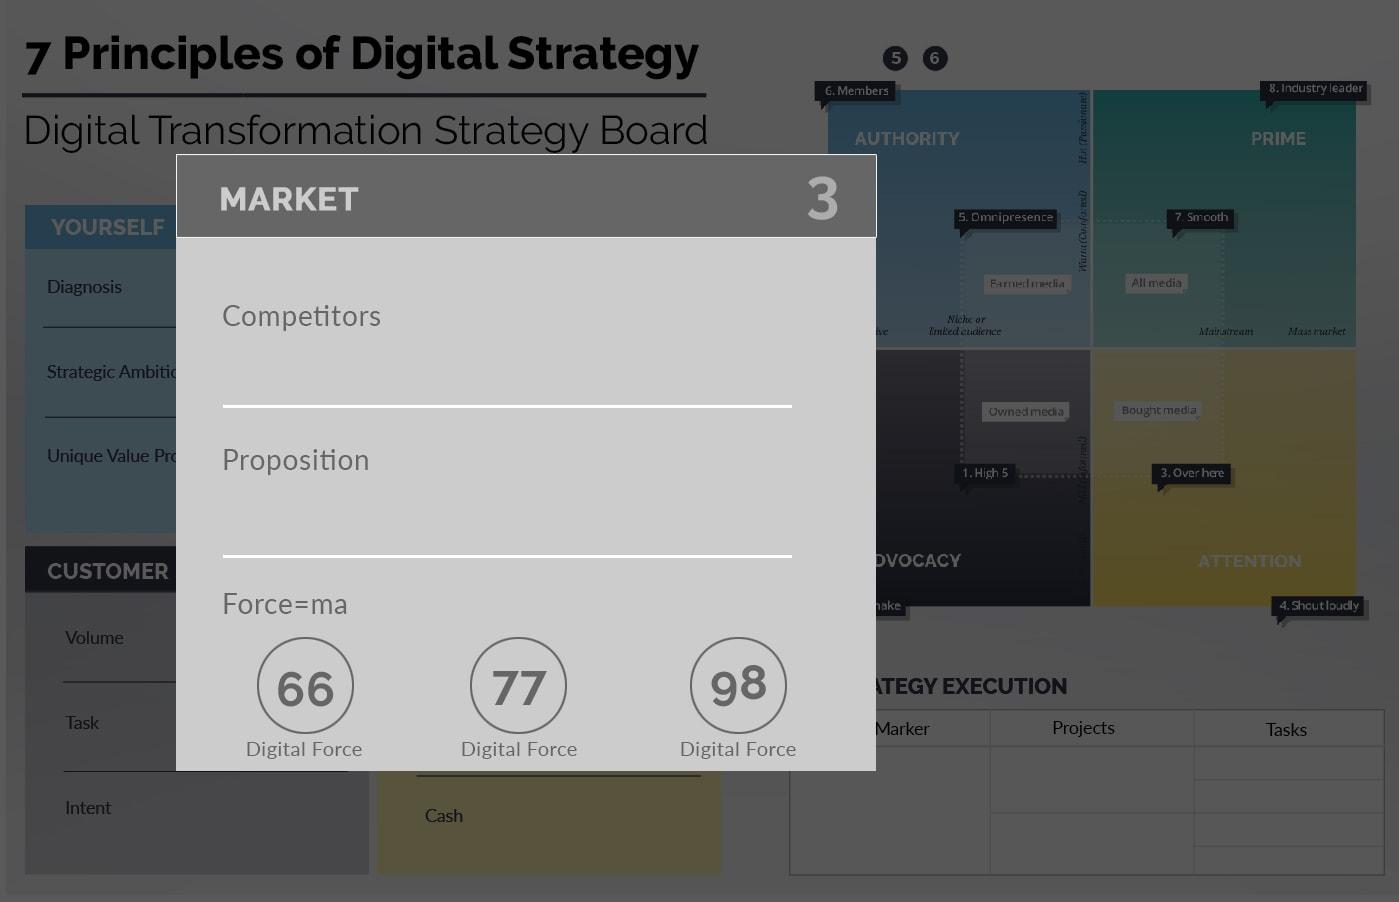 Ionology Digital Transformation Framework - Market